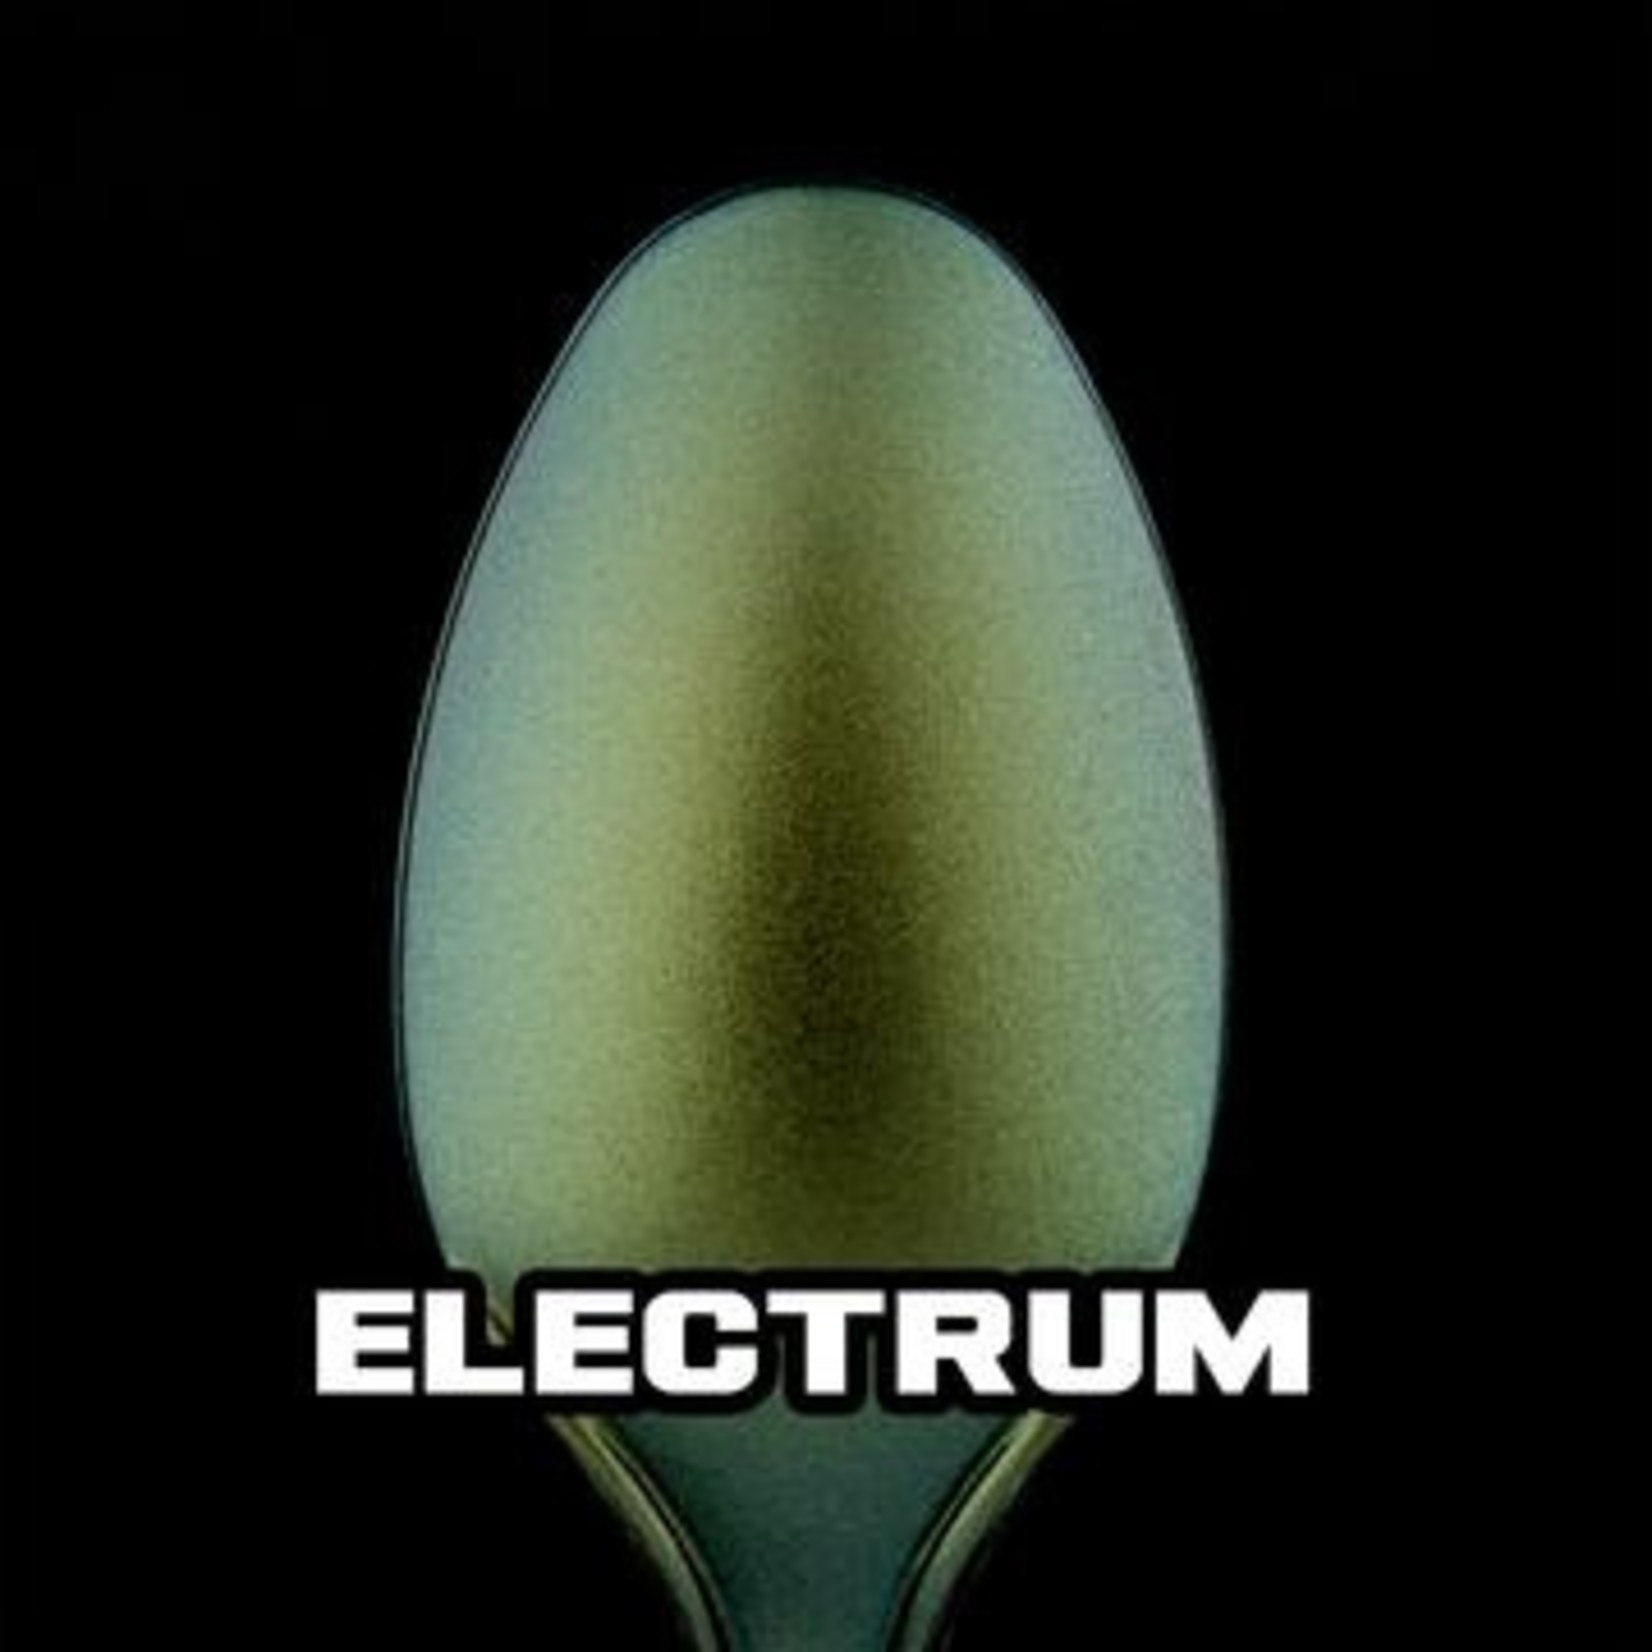 Turbo Dork Electrum (Turboshift)